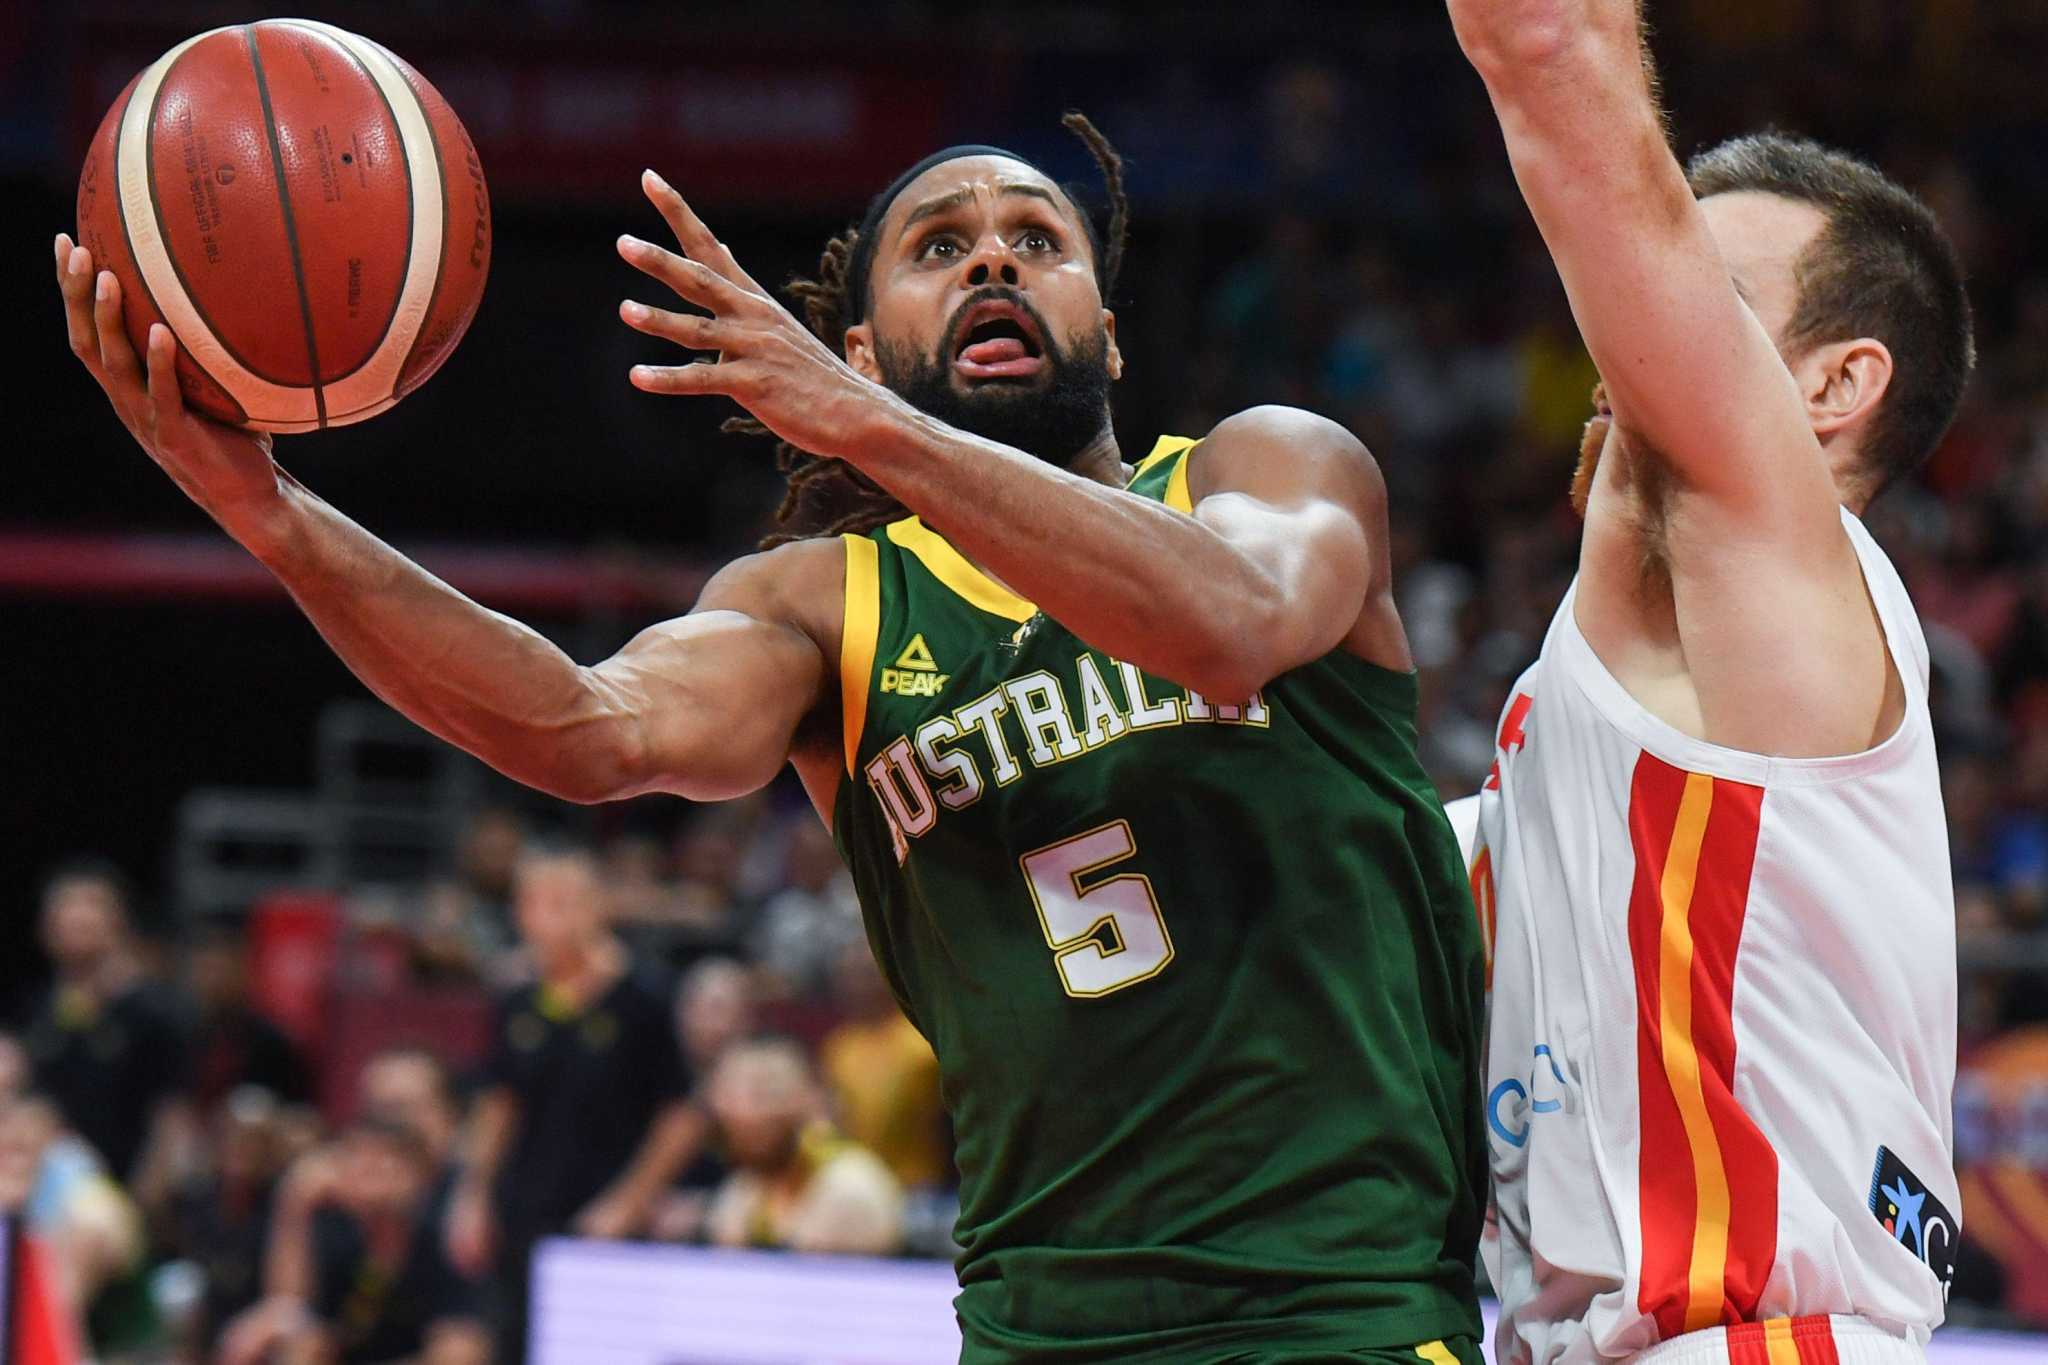 After 'life-changing' summer, Spurs' Mills back on the job